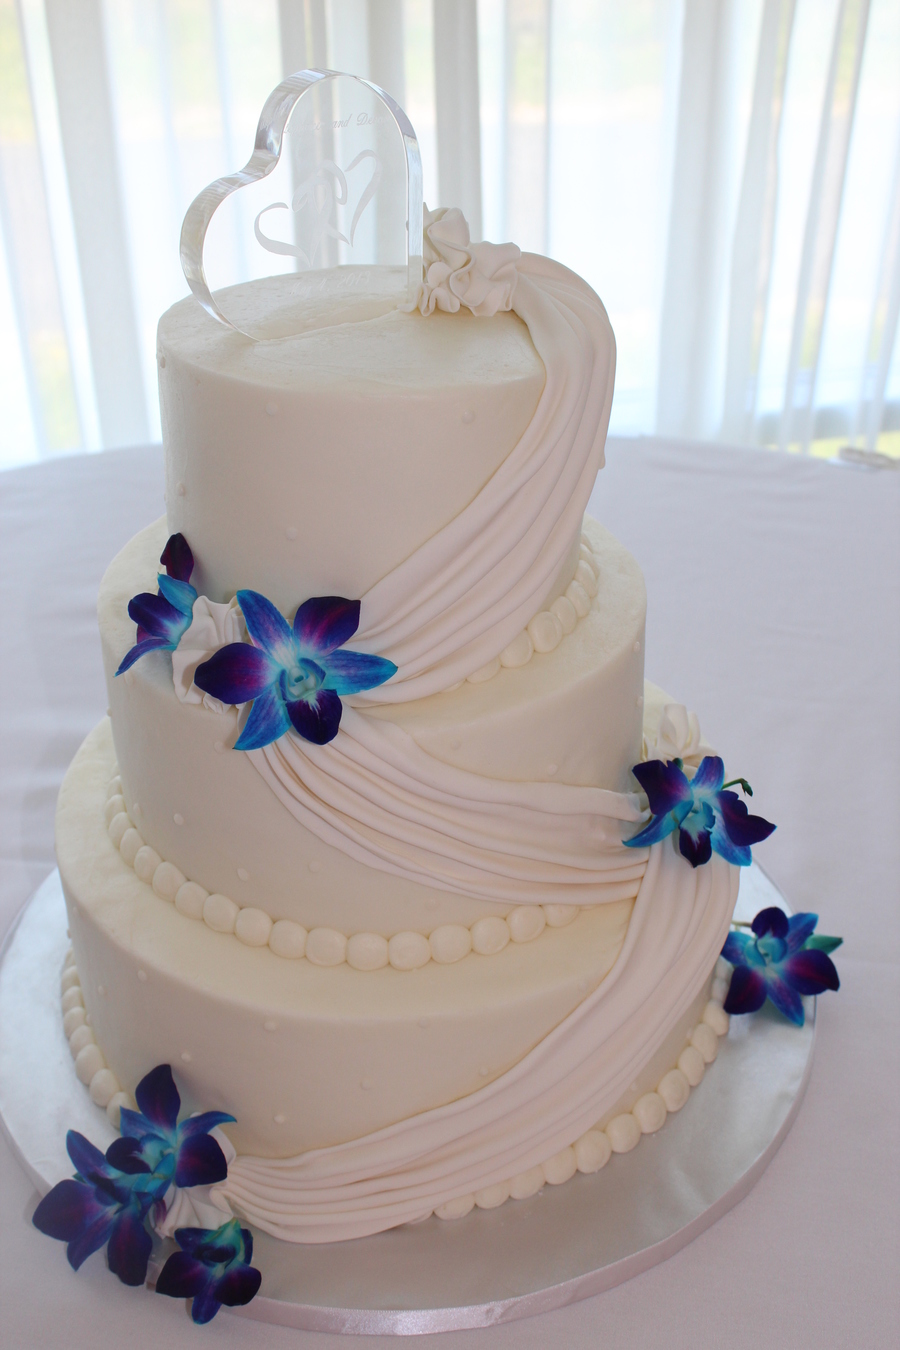 Swag Birthday Cake